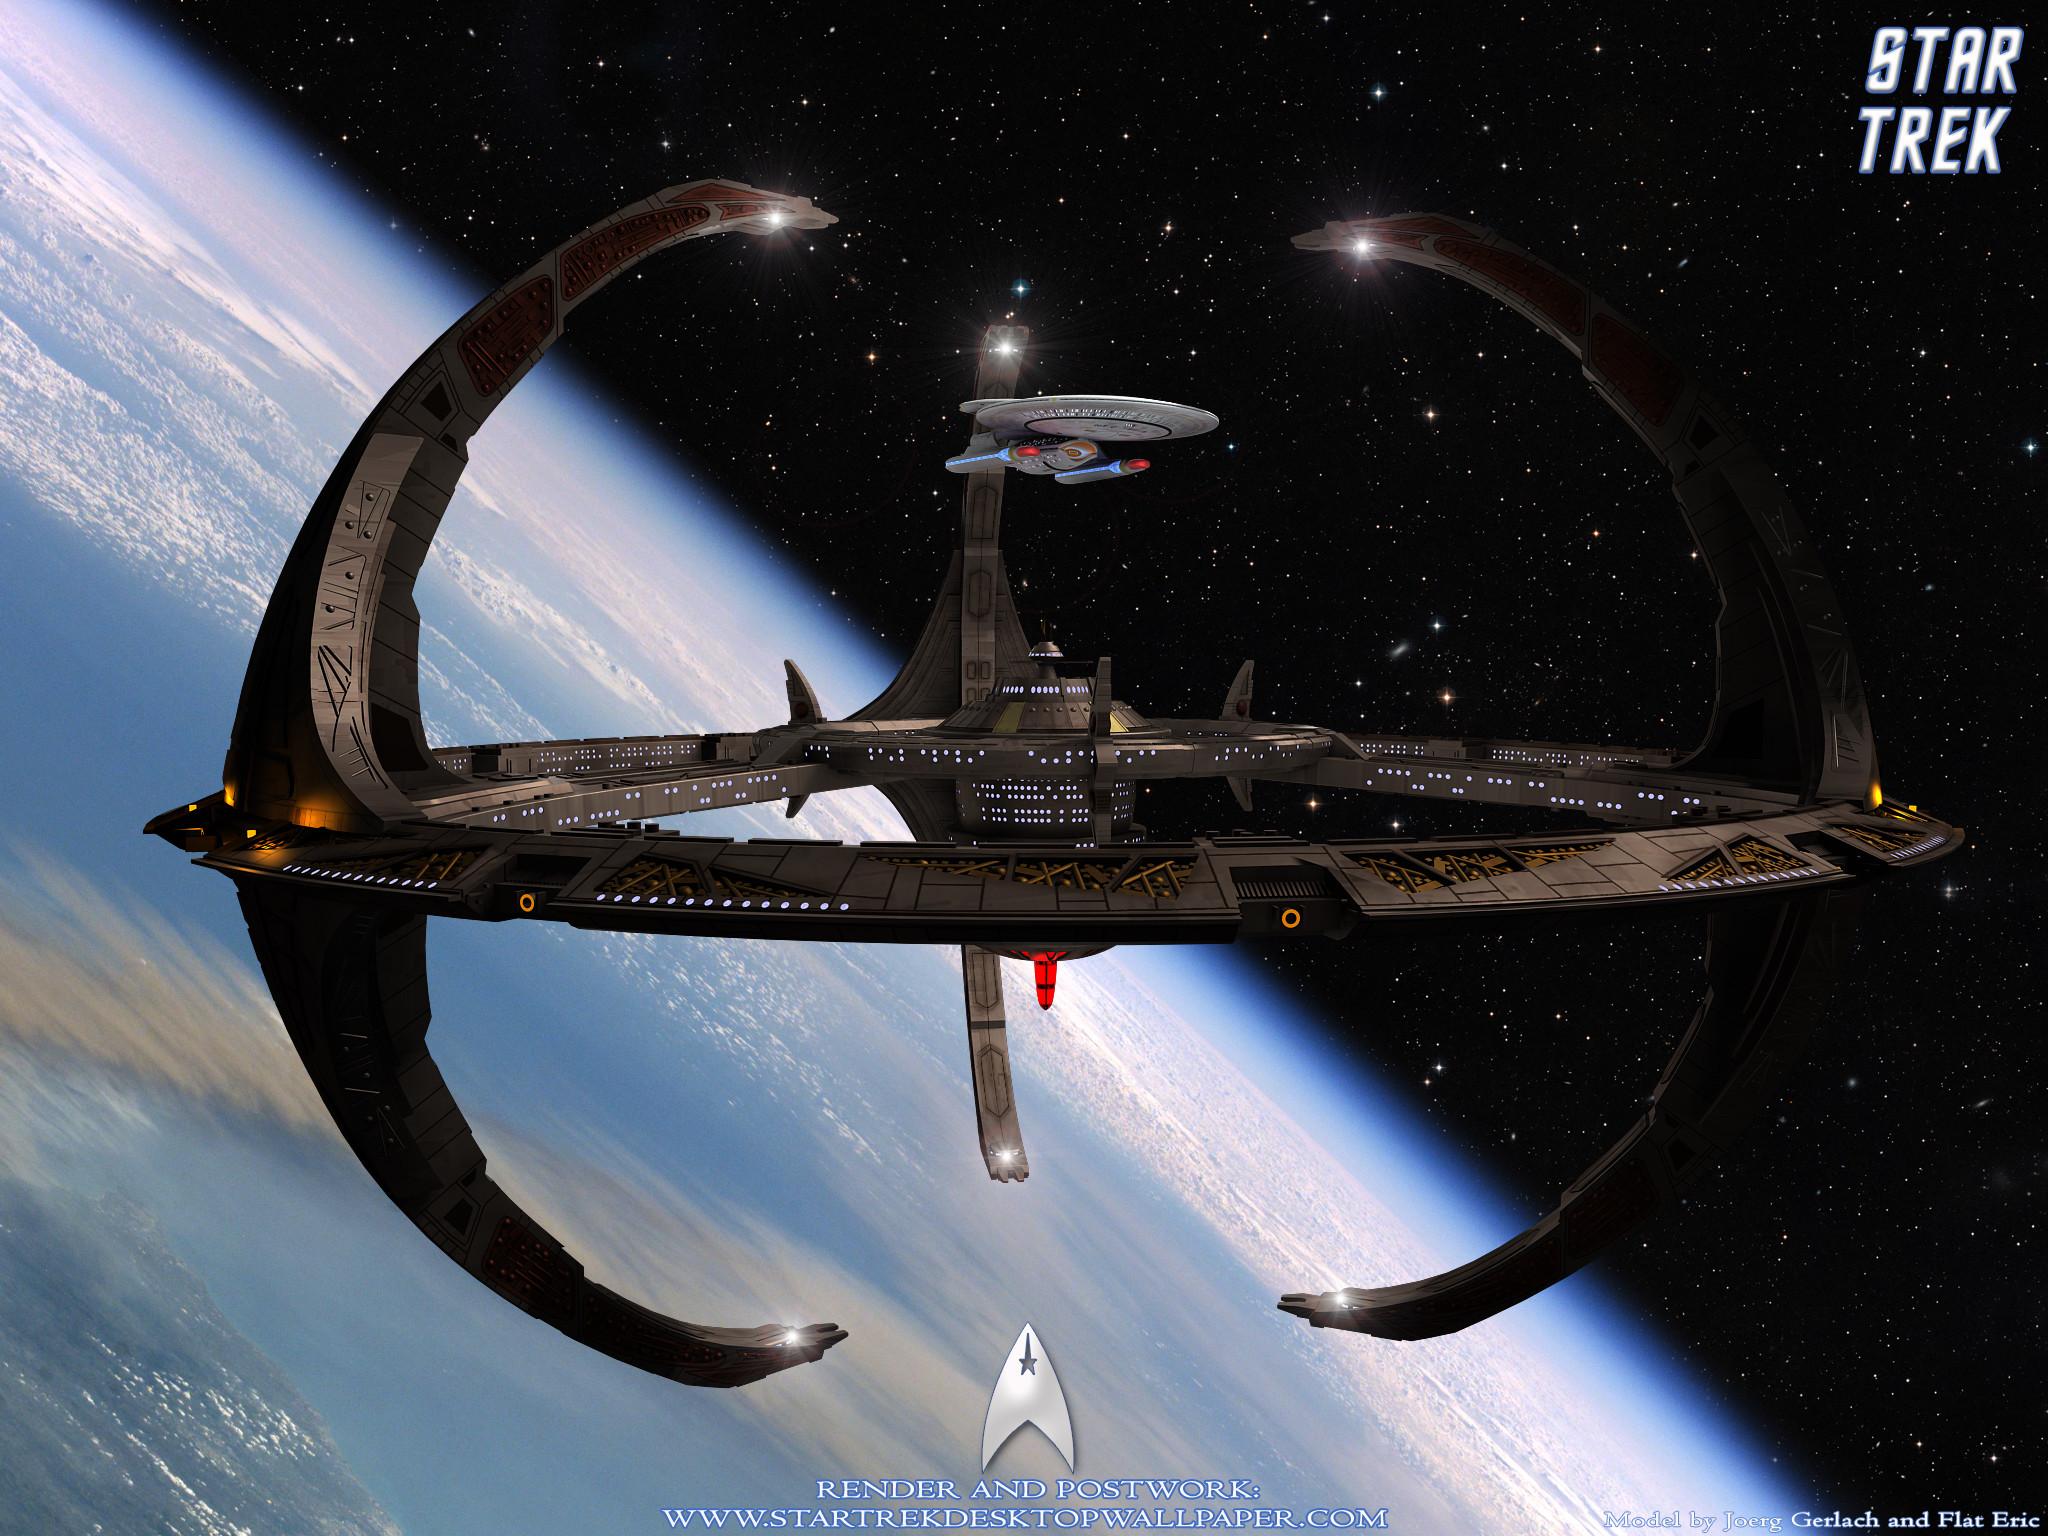 Star Trek Space Station And Nebula Class Starship. Free Star Trek computer  desktop wallpaper,